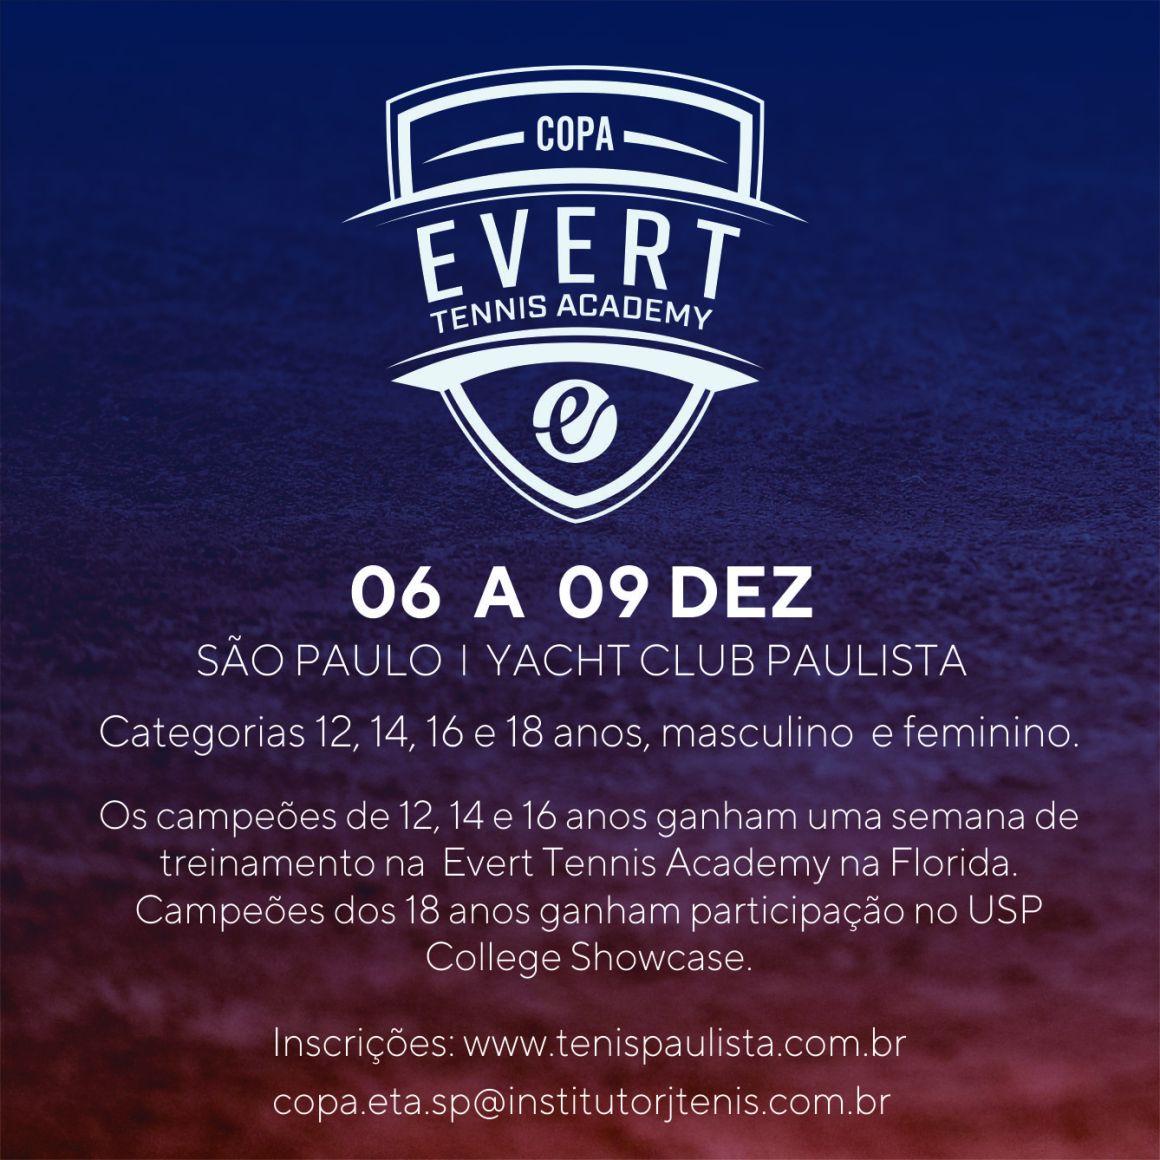 COPA EVERT TENNIS ACADEMY – ETAPA SÃO PAULO